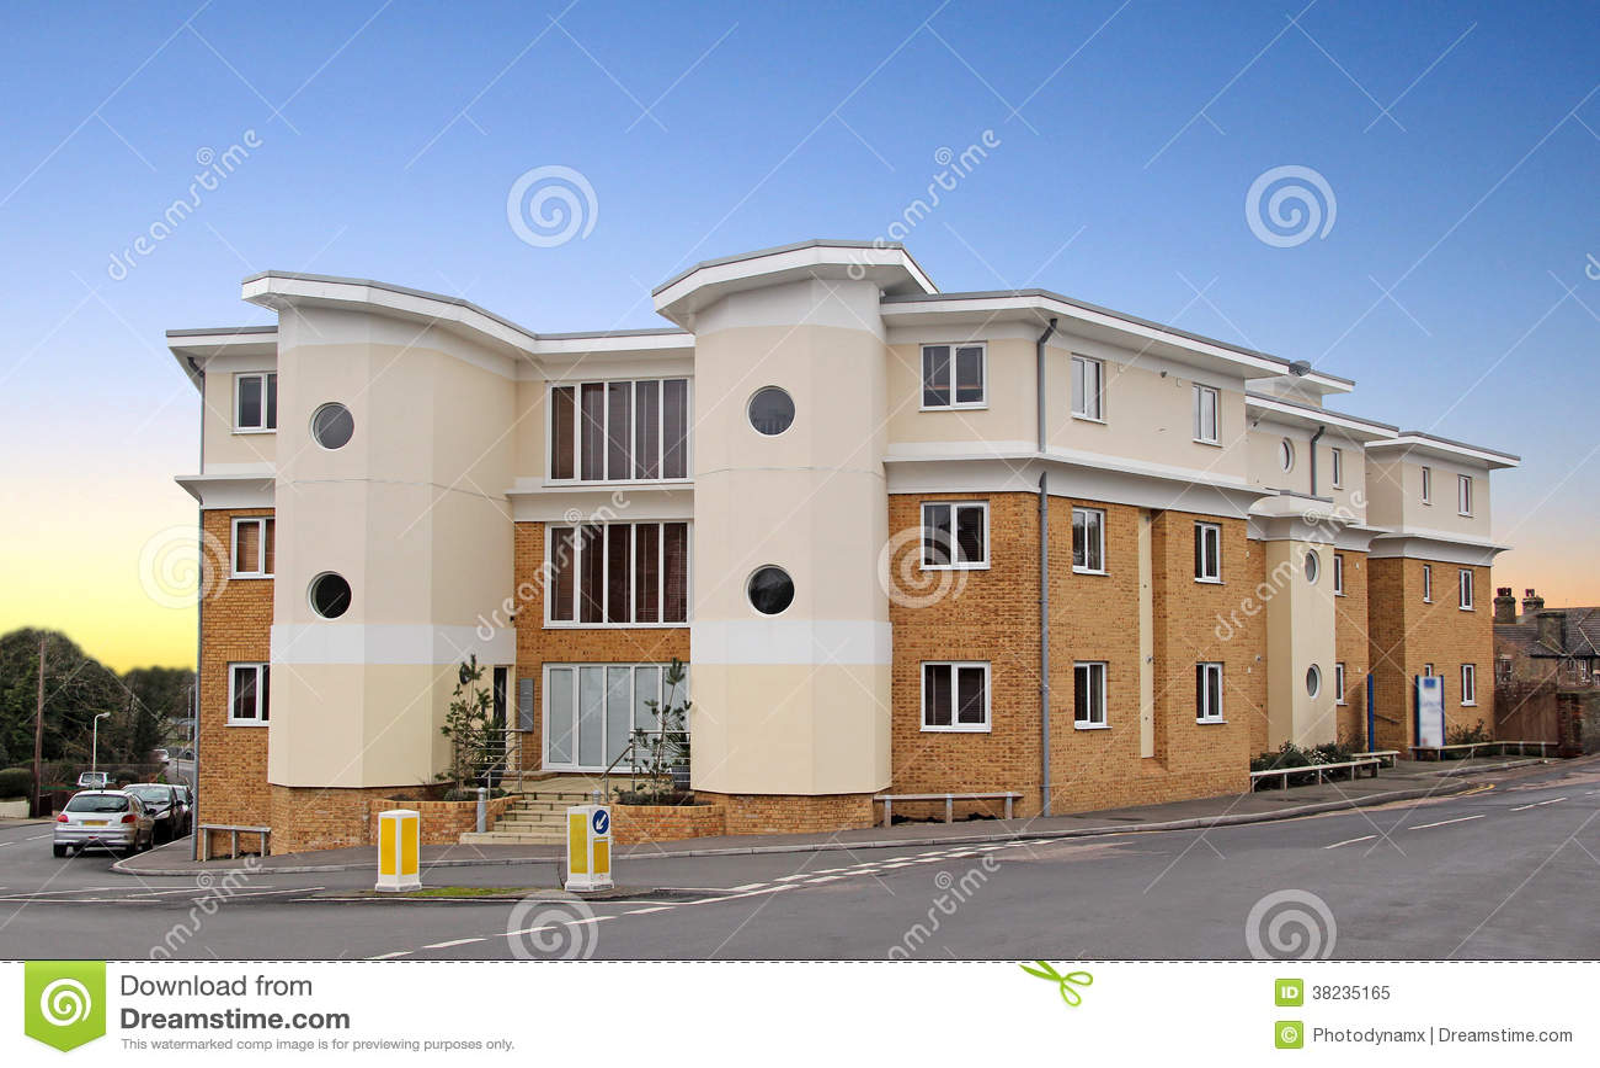 Modern Art Deco Style Apartments Royalty Free Stock Photo